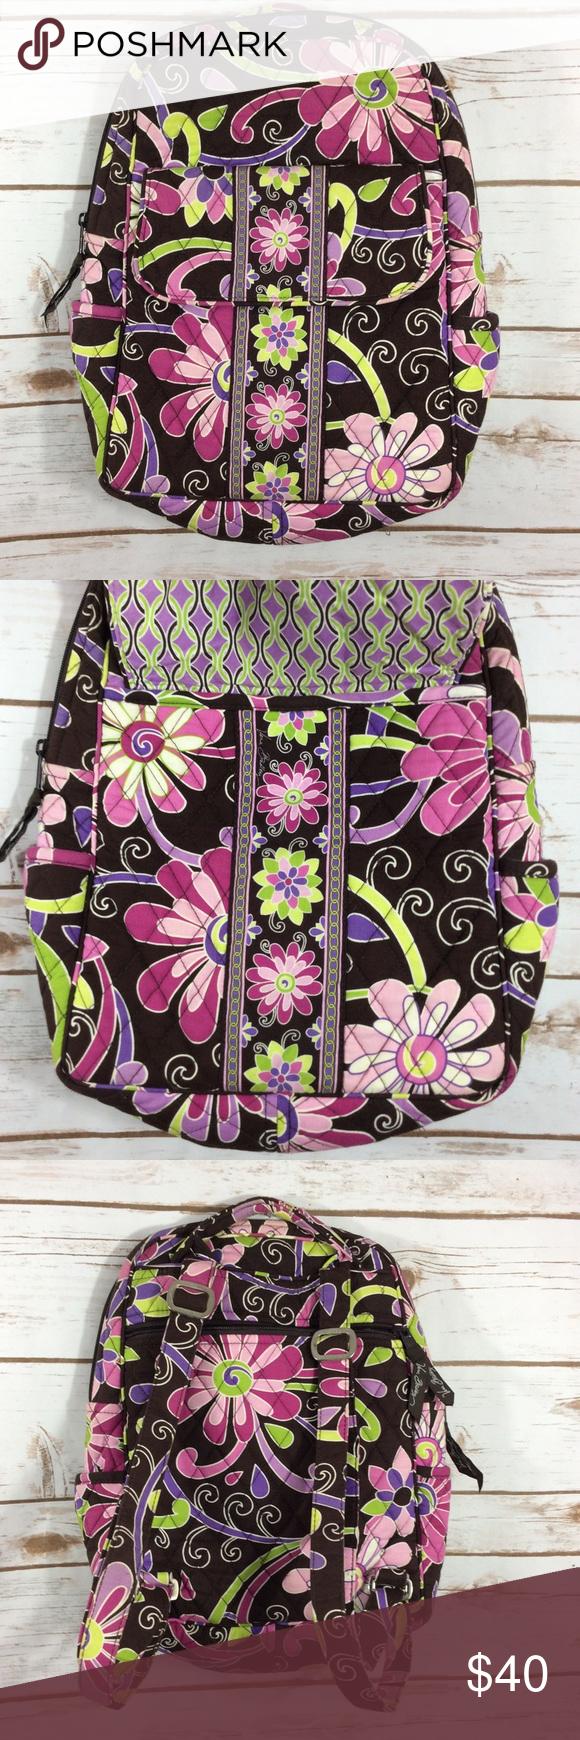 NWOT Vera Bradley purple punch mini backpack NWOT Vera Bradley purple punch  mini backpack. Measures cfe7cf5b3d